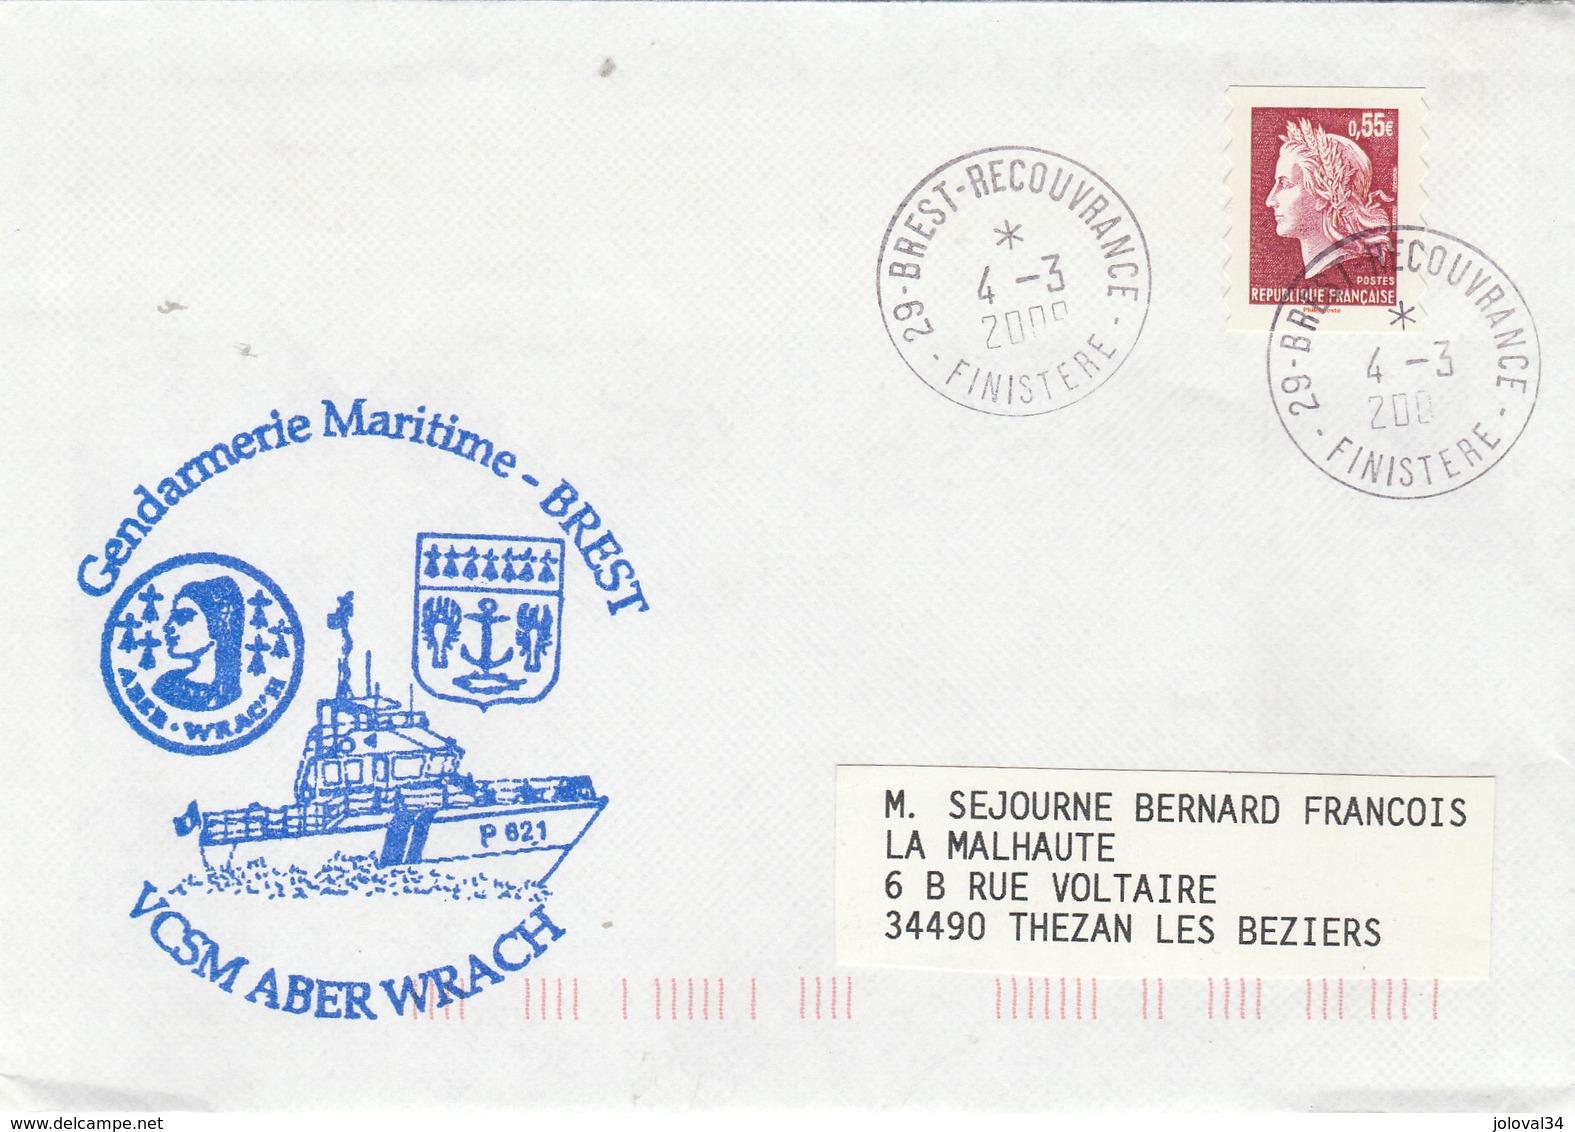 Gendarmerie Maritime VCSM ABER WRACH P 621 Brest 4/3/2009 - Postmark Collection (Covers)